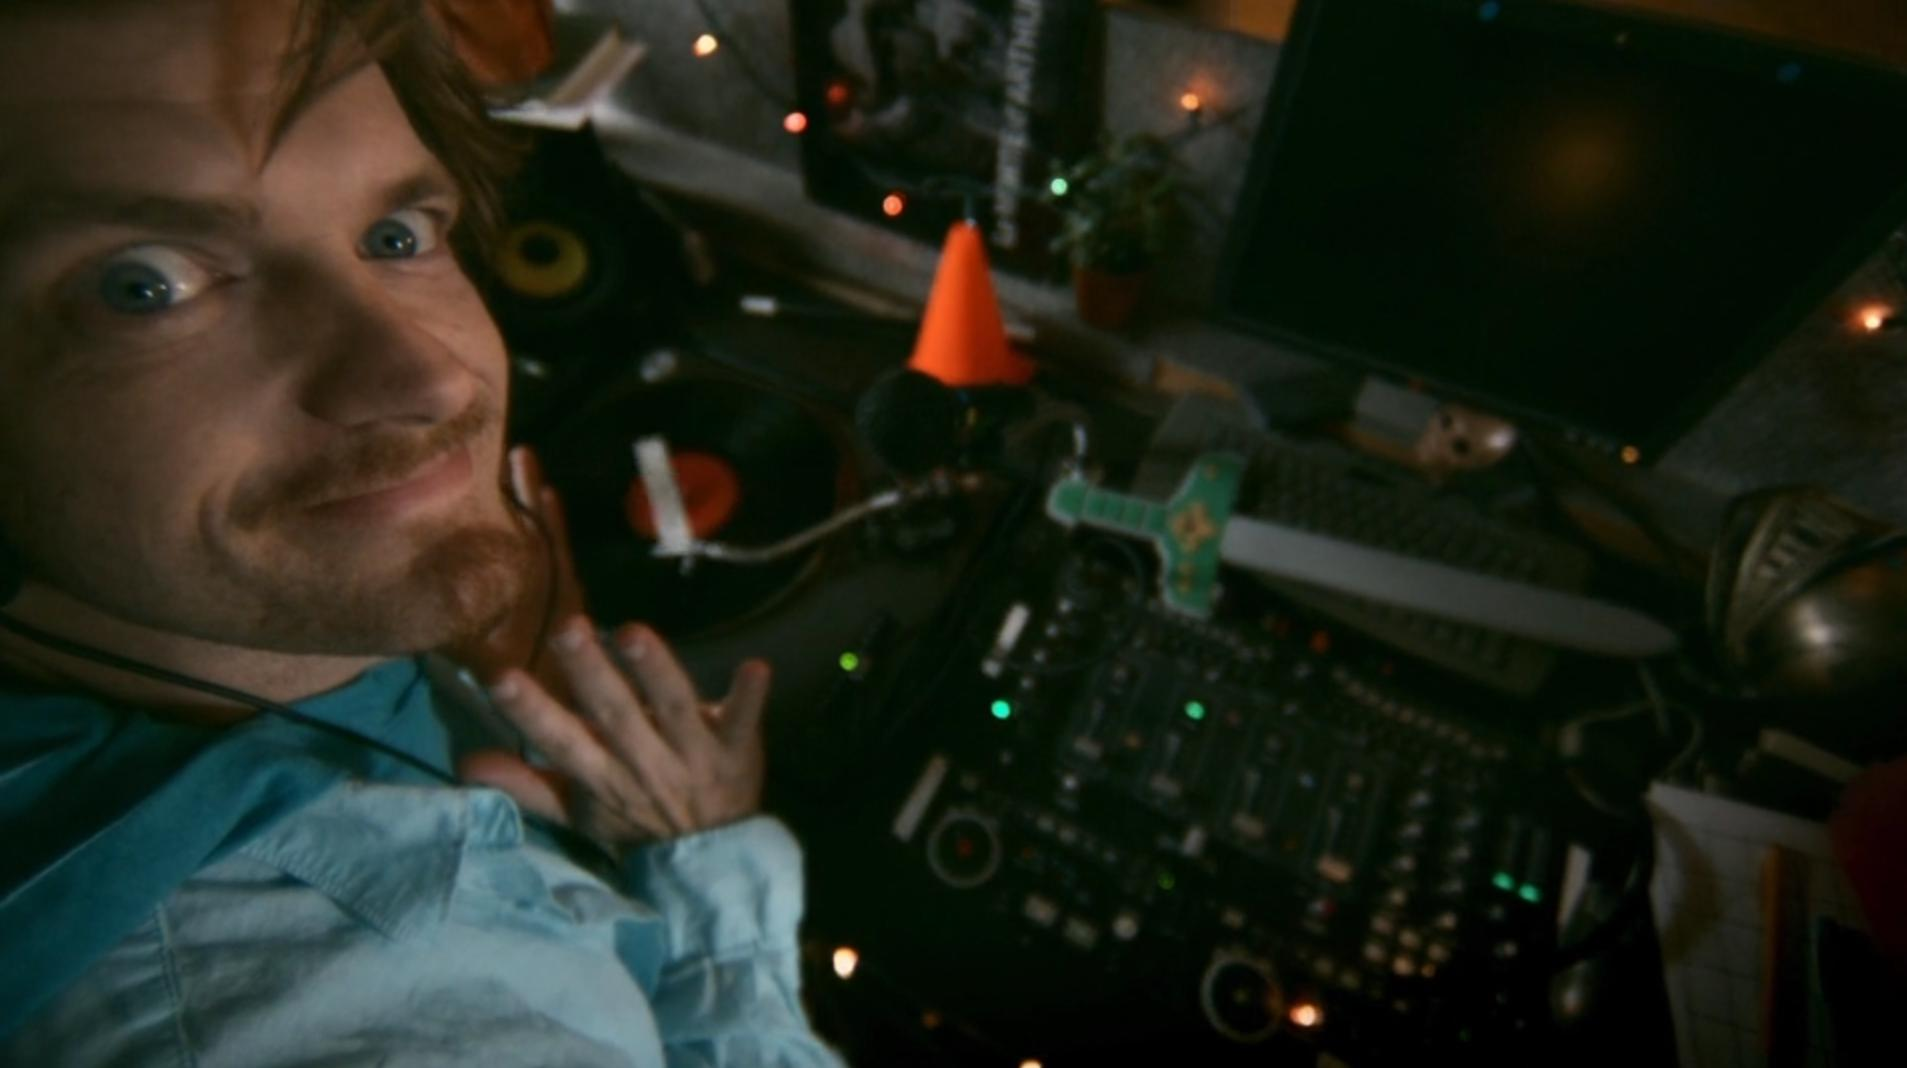 Peter Bedgood in The Rock 'n' Roll Dreams of Duncan Christopher (2010)